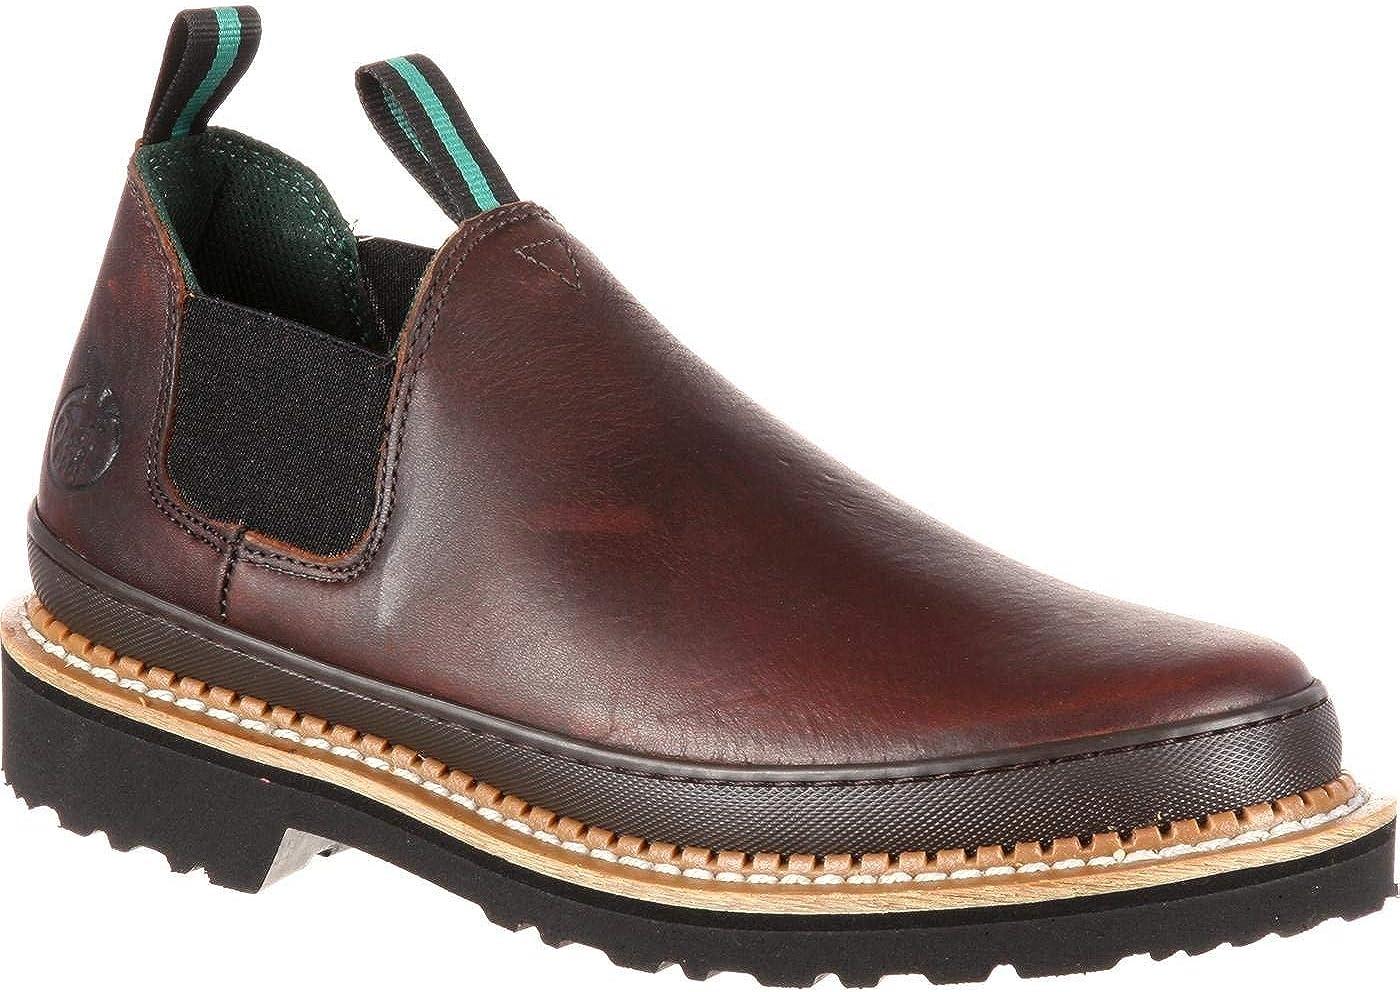 Georgia Giant Men's Romeo Slip-On Work Shoe 71L8Dle1tHLUL1400_